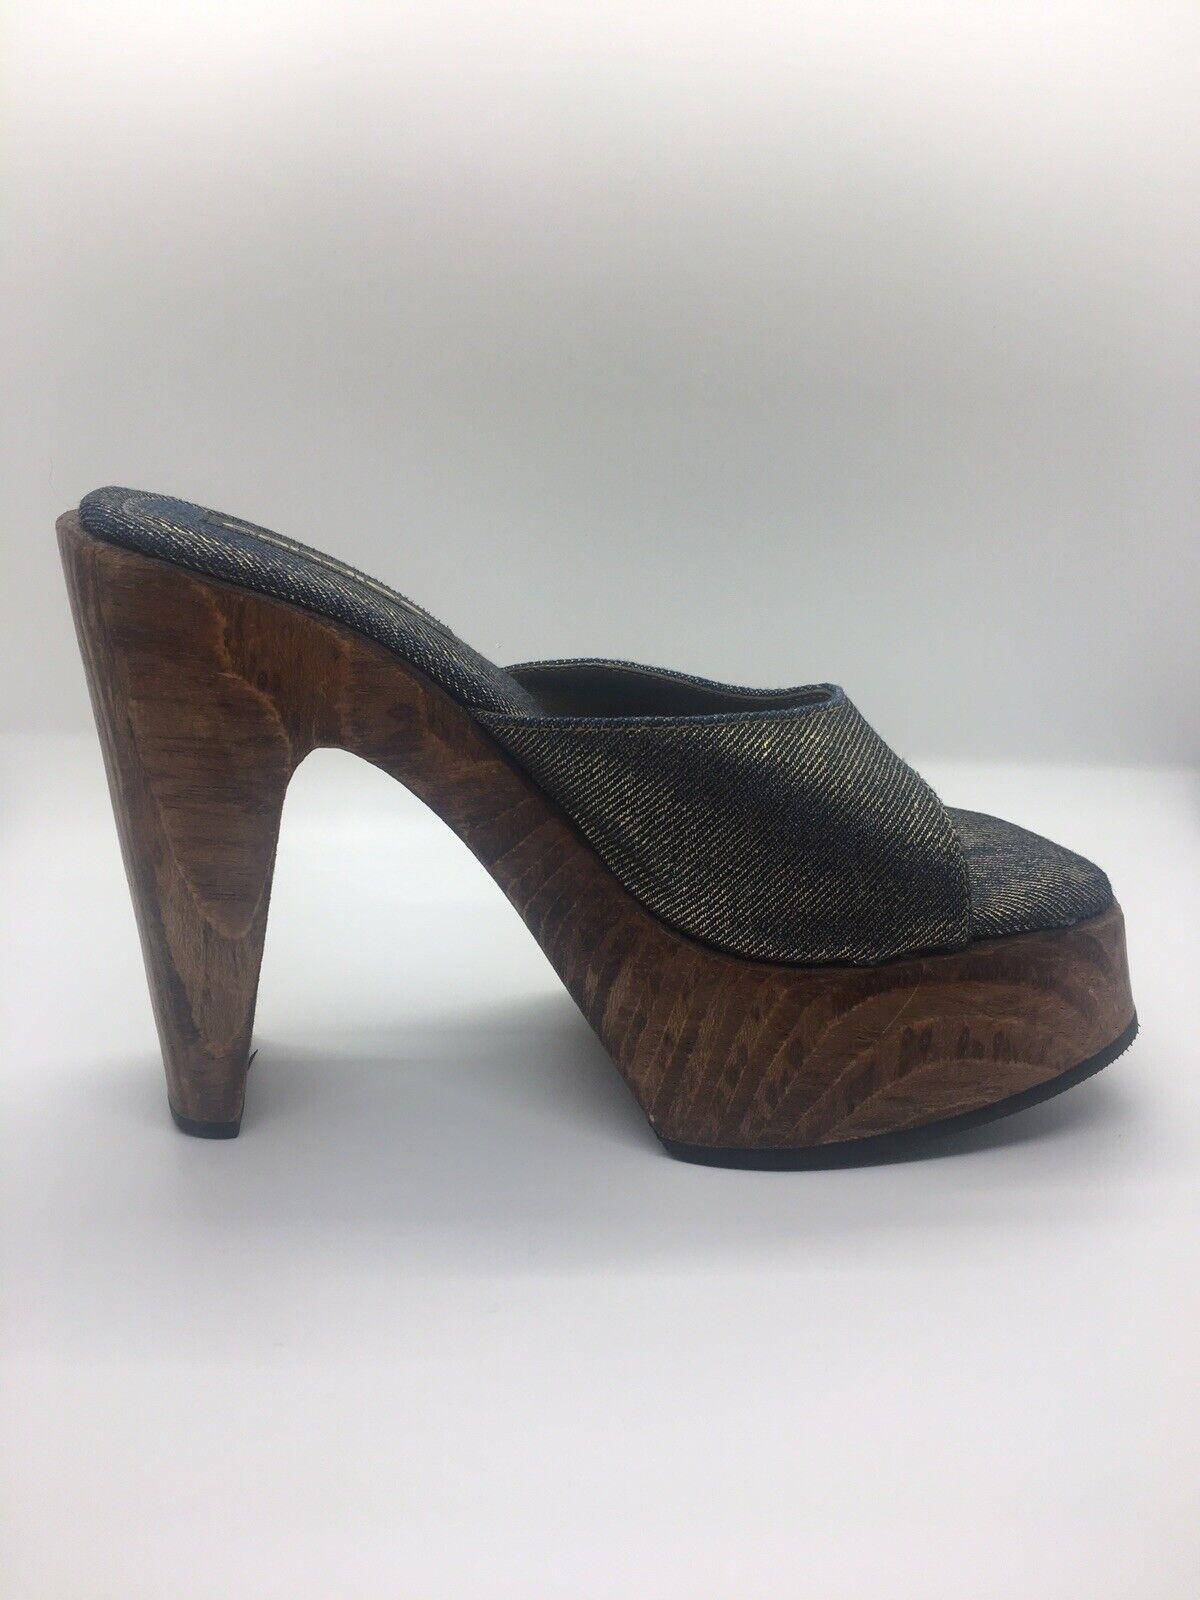 CANDIE'S Vintage 1990's Denim Platform Block Heel… - image 3